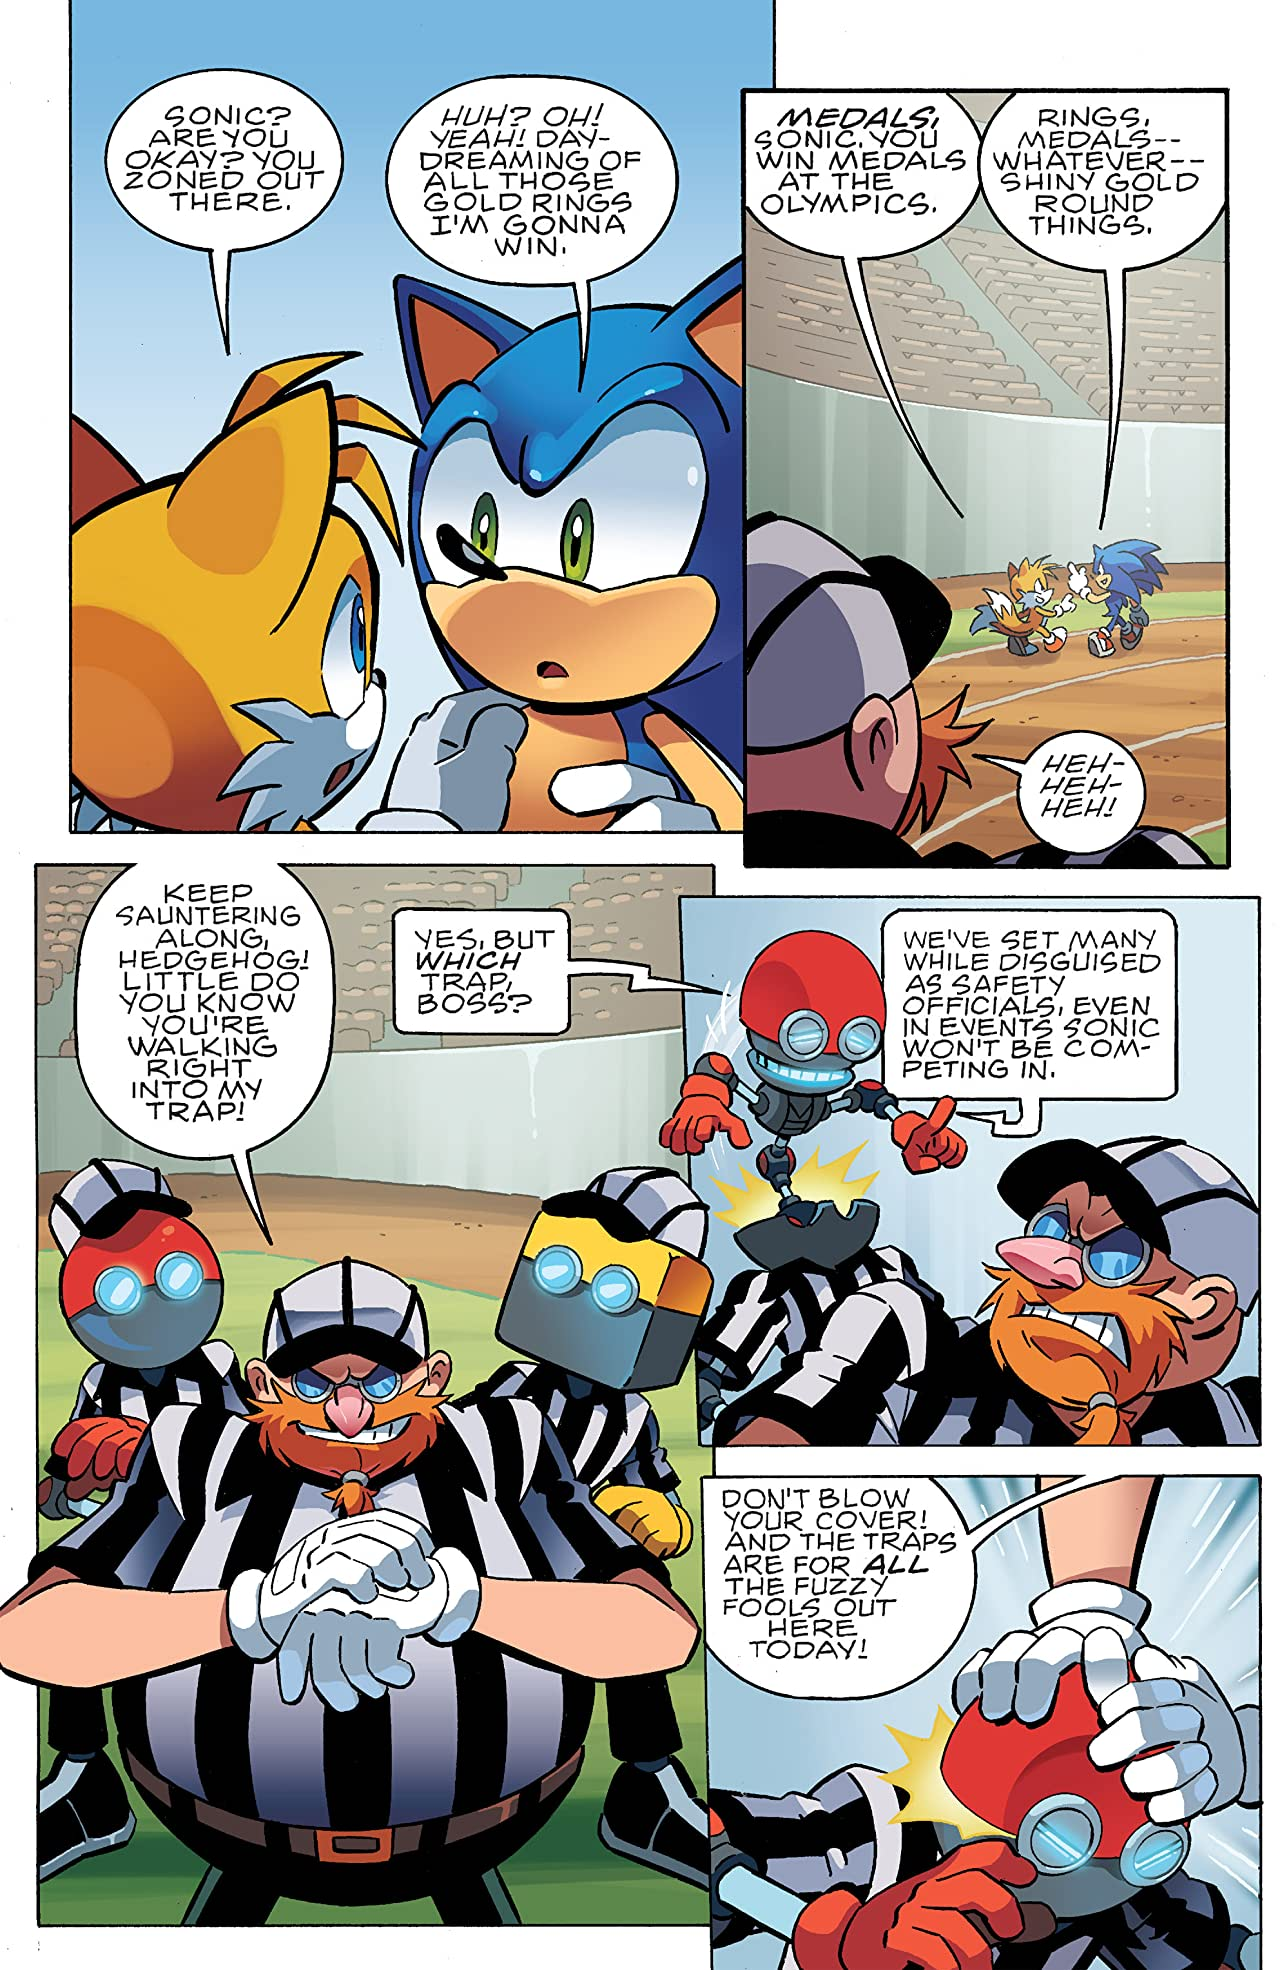 Sonic the Hedgehog #242